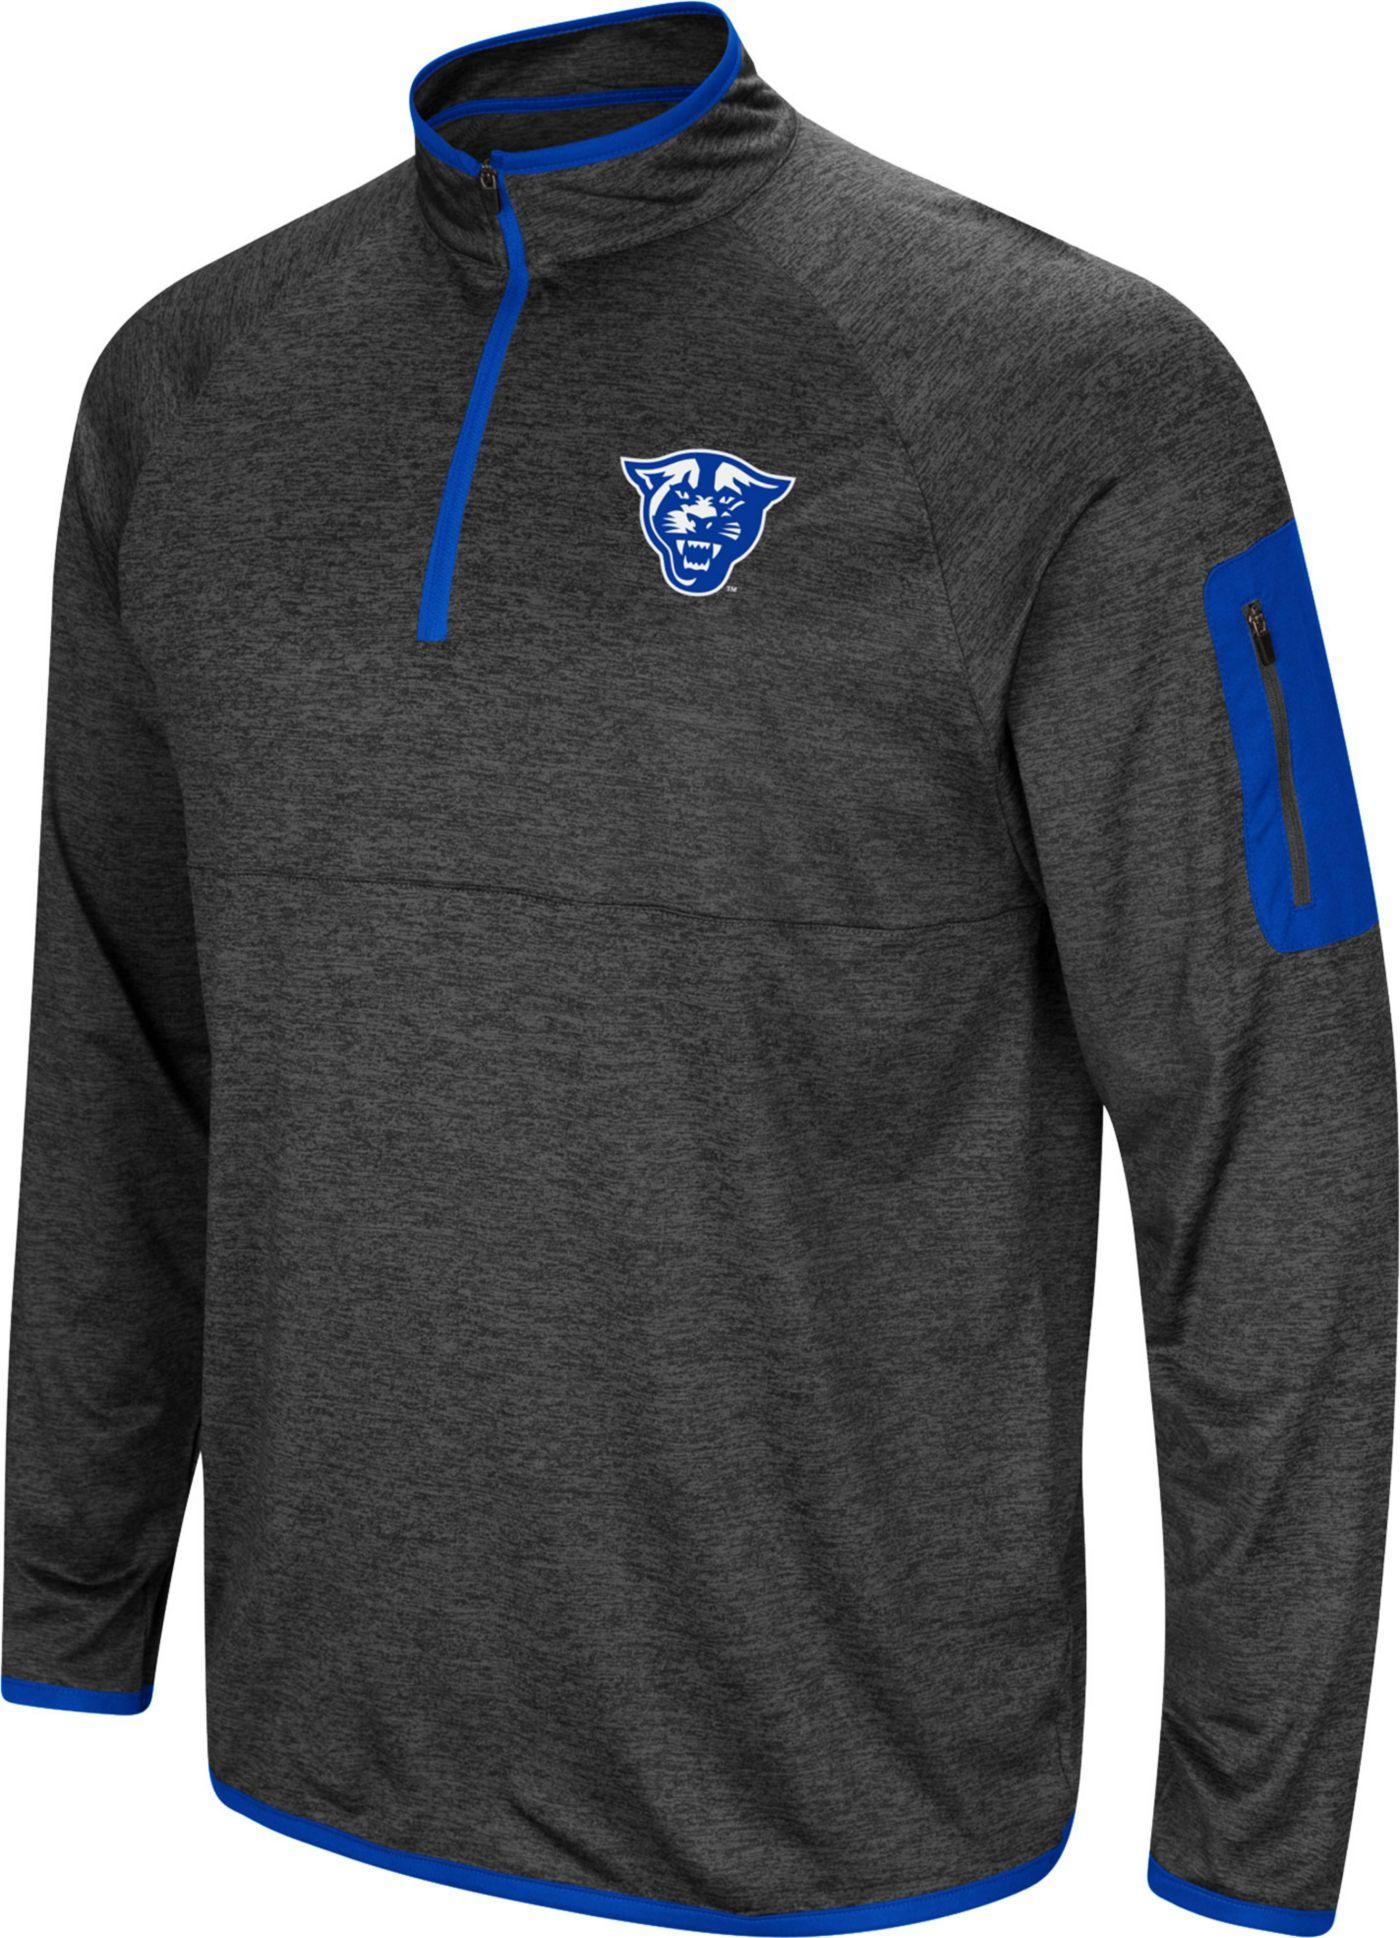 cheap for discount 8d3d6 dfd9b Colosseum Men's Georgia State Panthers Grey Amnesia Quarter-Zip Shirt